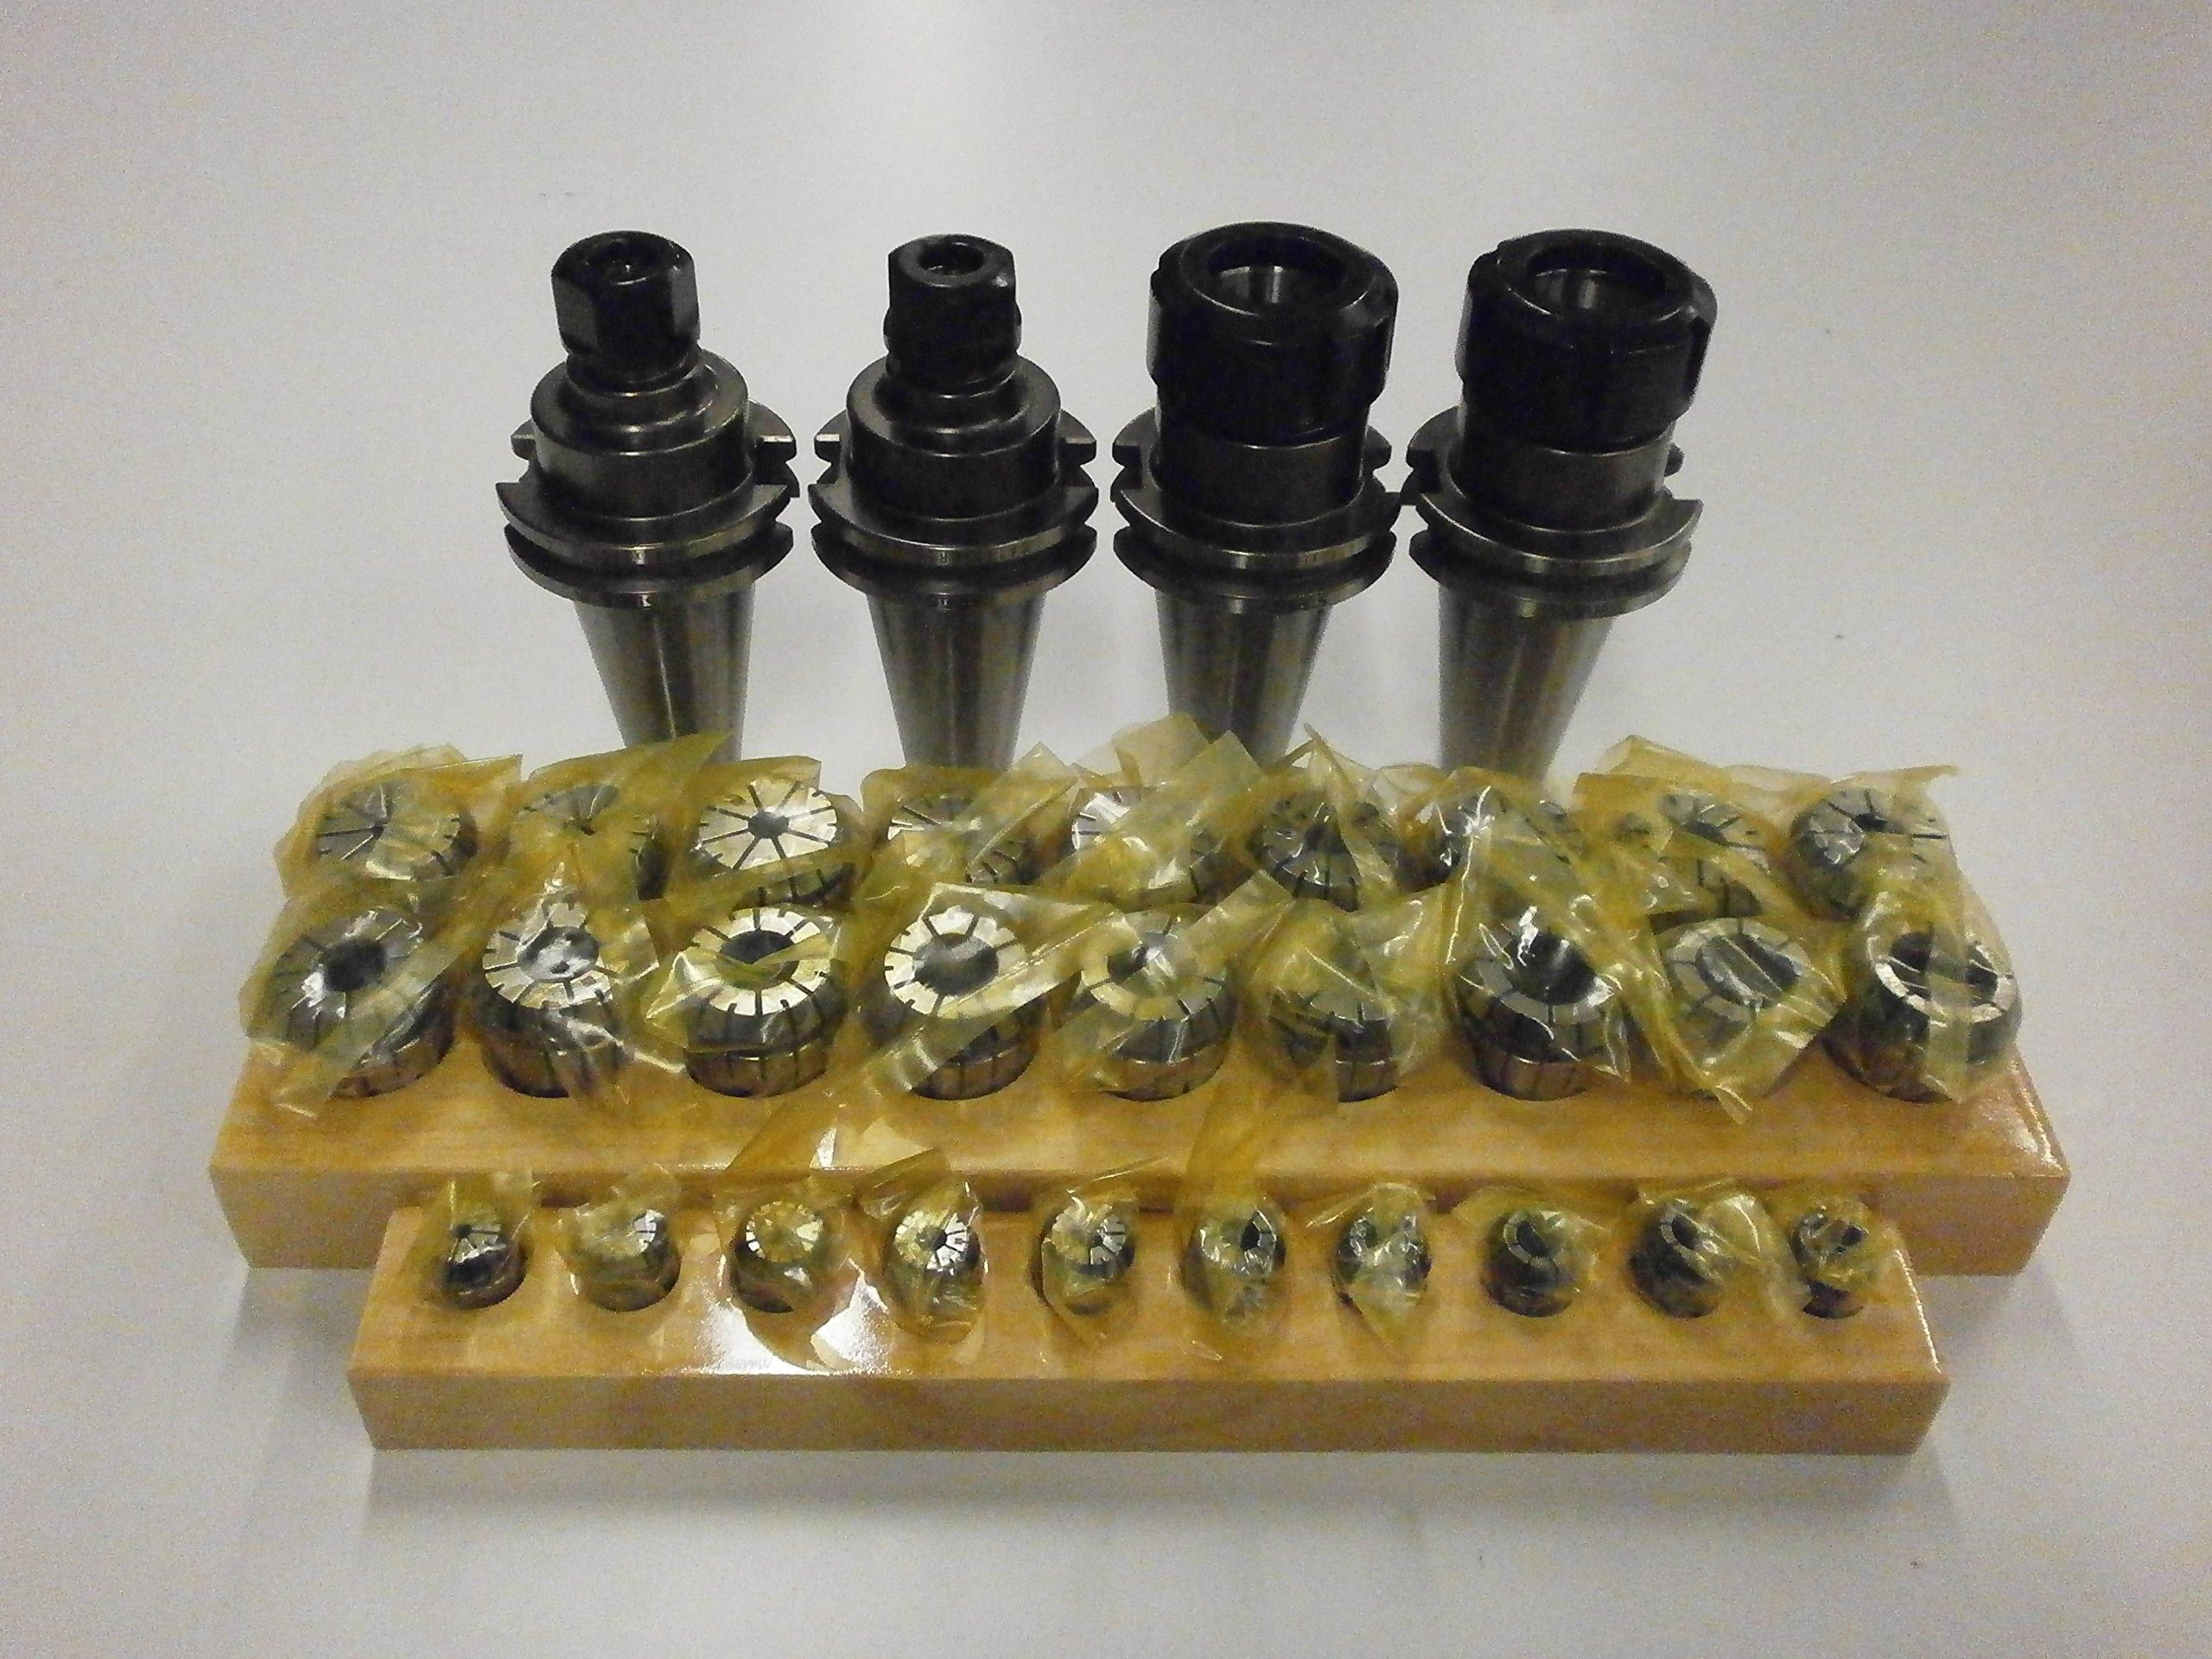 SIMIS Tooling Package by Techniks CAT40 ER32 & ER16 Precision Collet Chuck Package with ER16 & ER32 Collet Sets